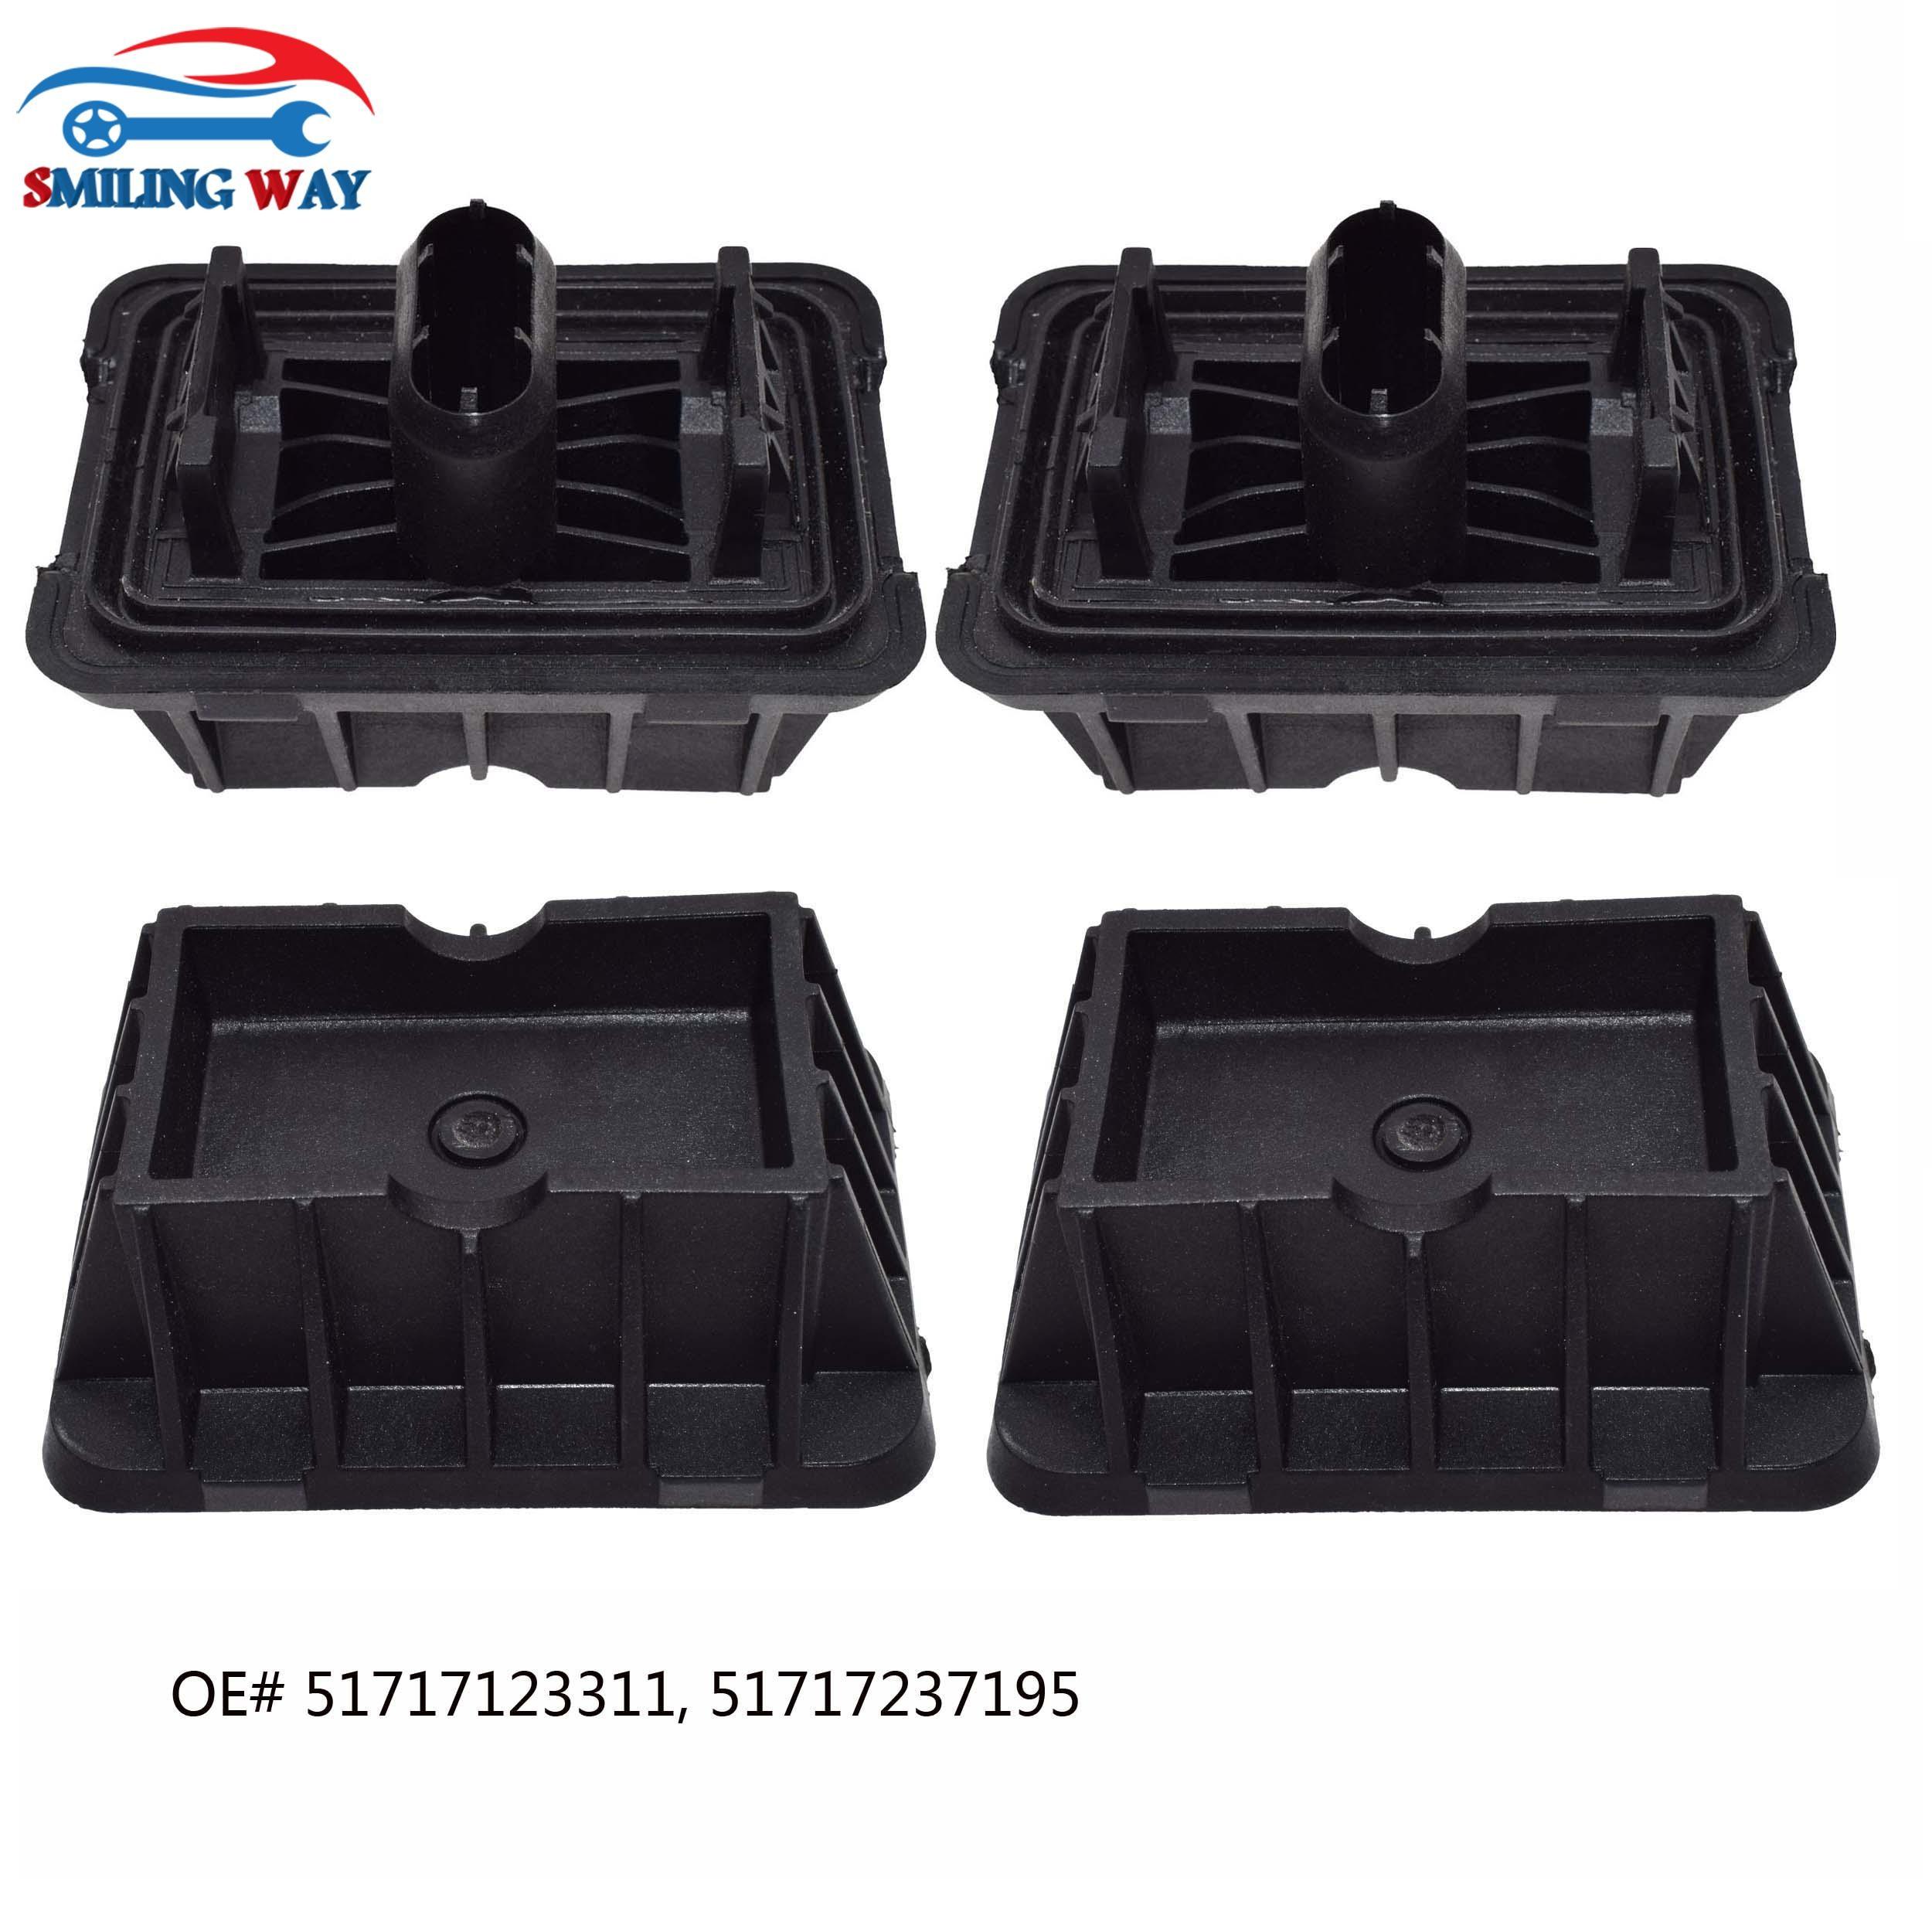 Under Car Support for Lifting E82 E84 E88 E90 E91 F01 F02 F10 F12 BMW Jack Pad